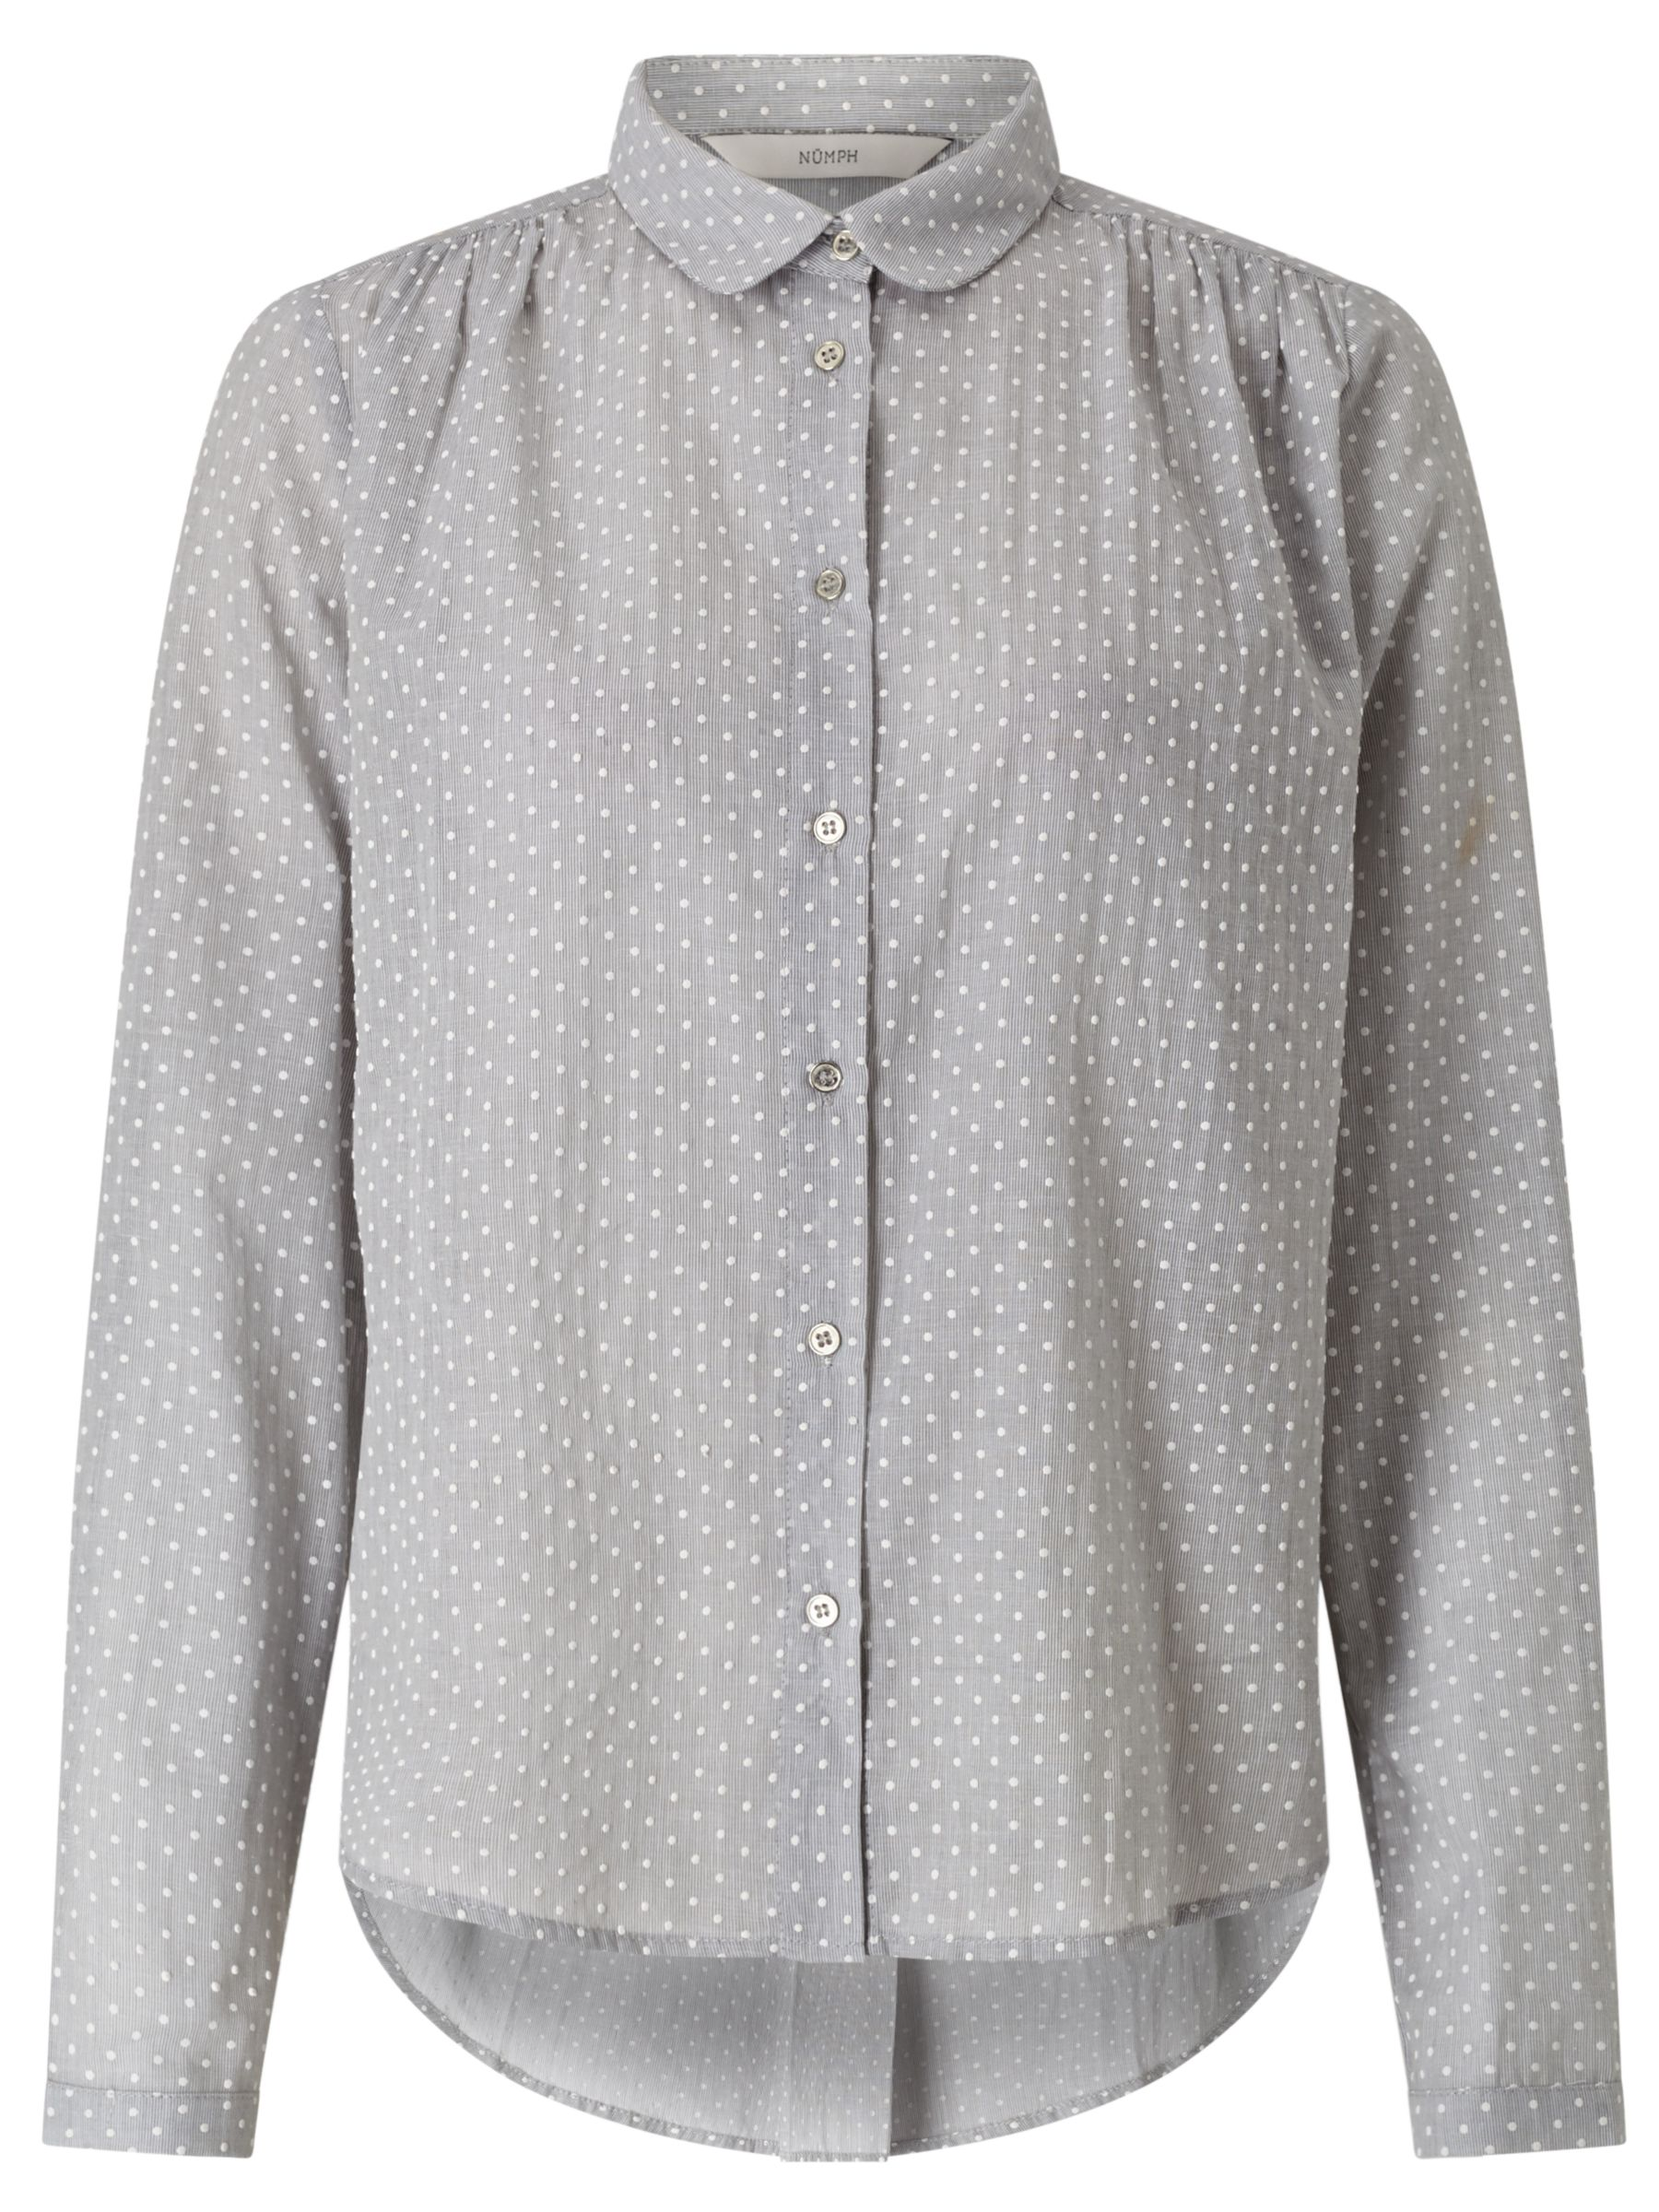 Numph Numph Nadja Dot Shirt, Light Grey Melange